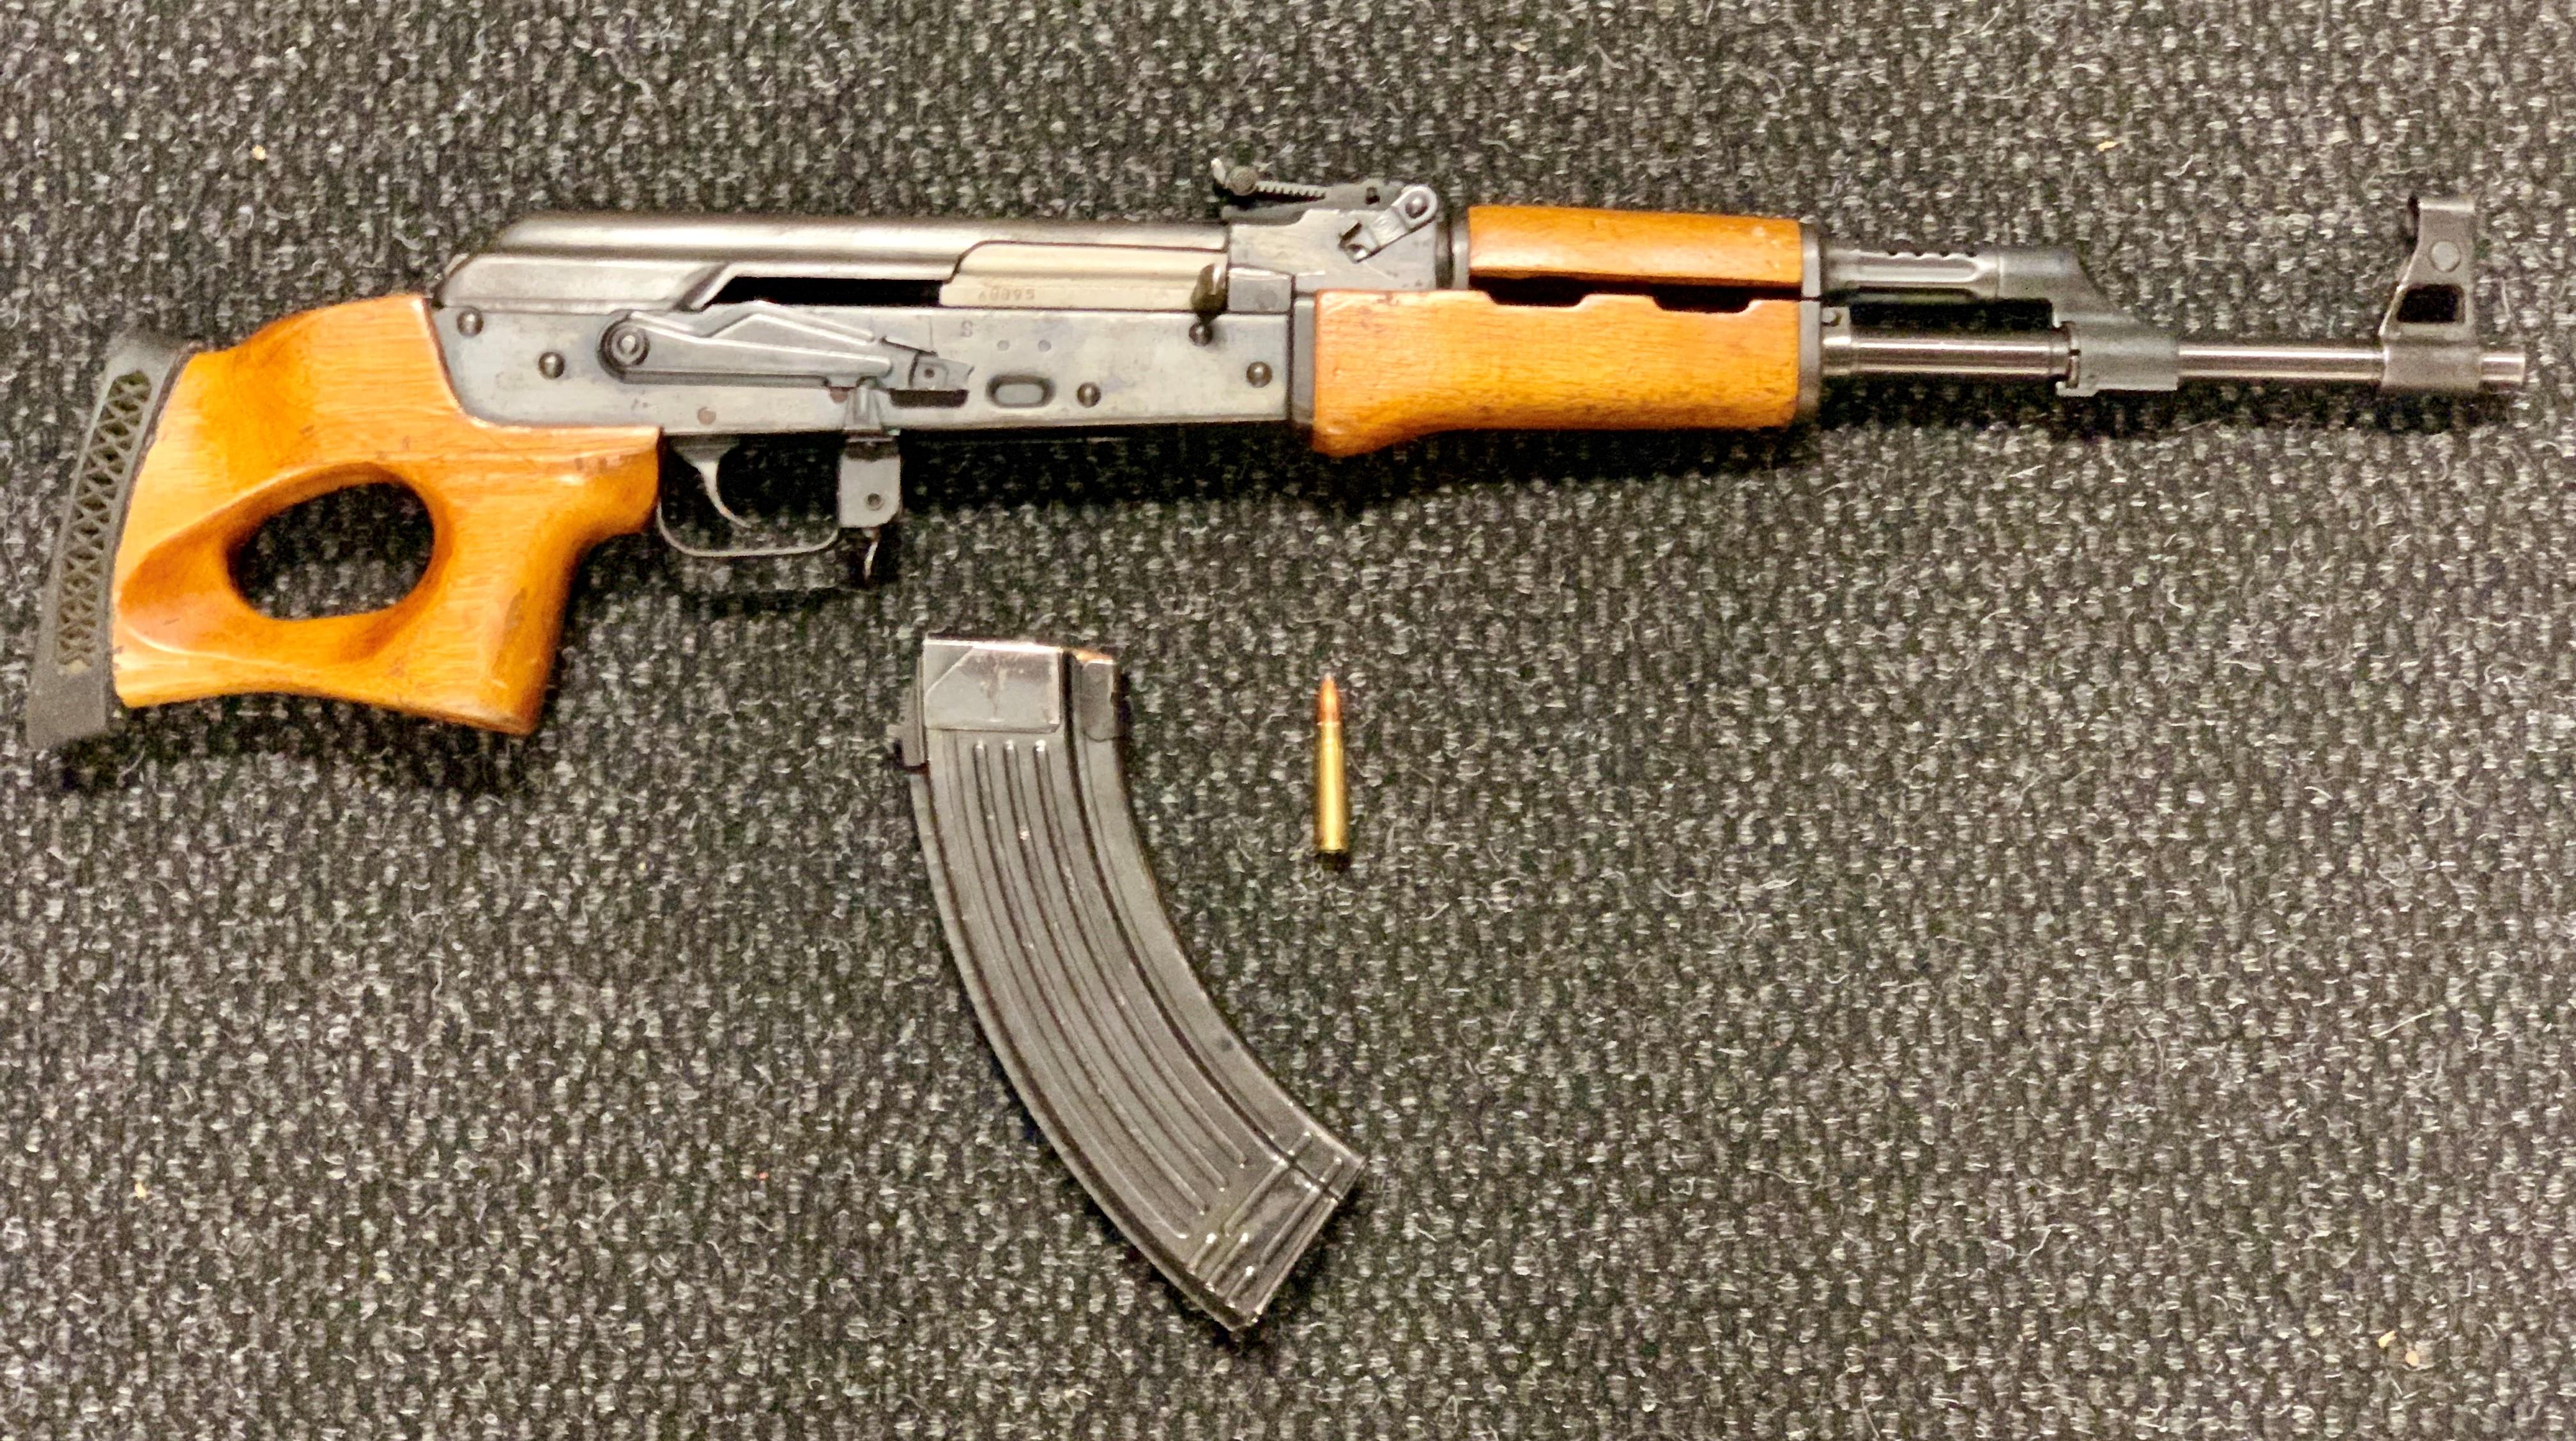 Fairfield Police DUI Enforcement Team recovers AK-47 rifle - ABC7 San  Francisco